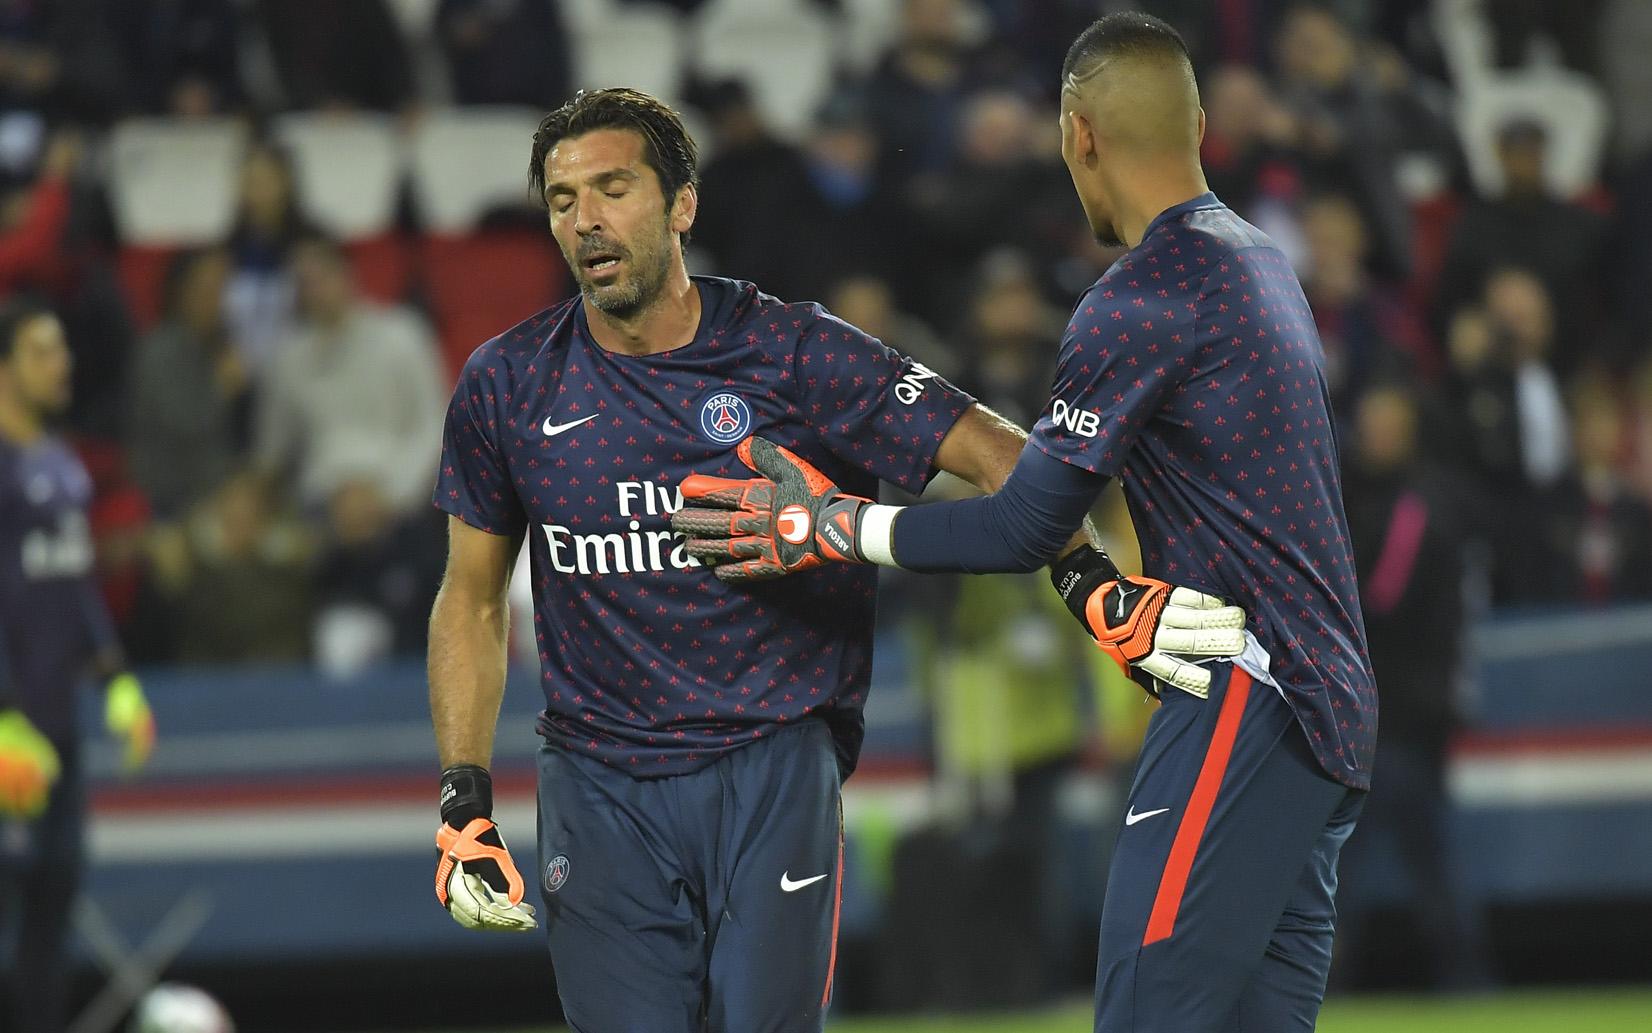 Football - Ligue 1 - Le PSG sans Thiago Silva face à l'OM, avec Areola plutôt que Buffon